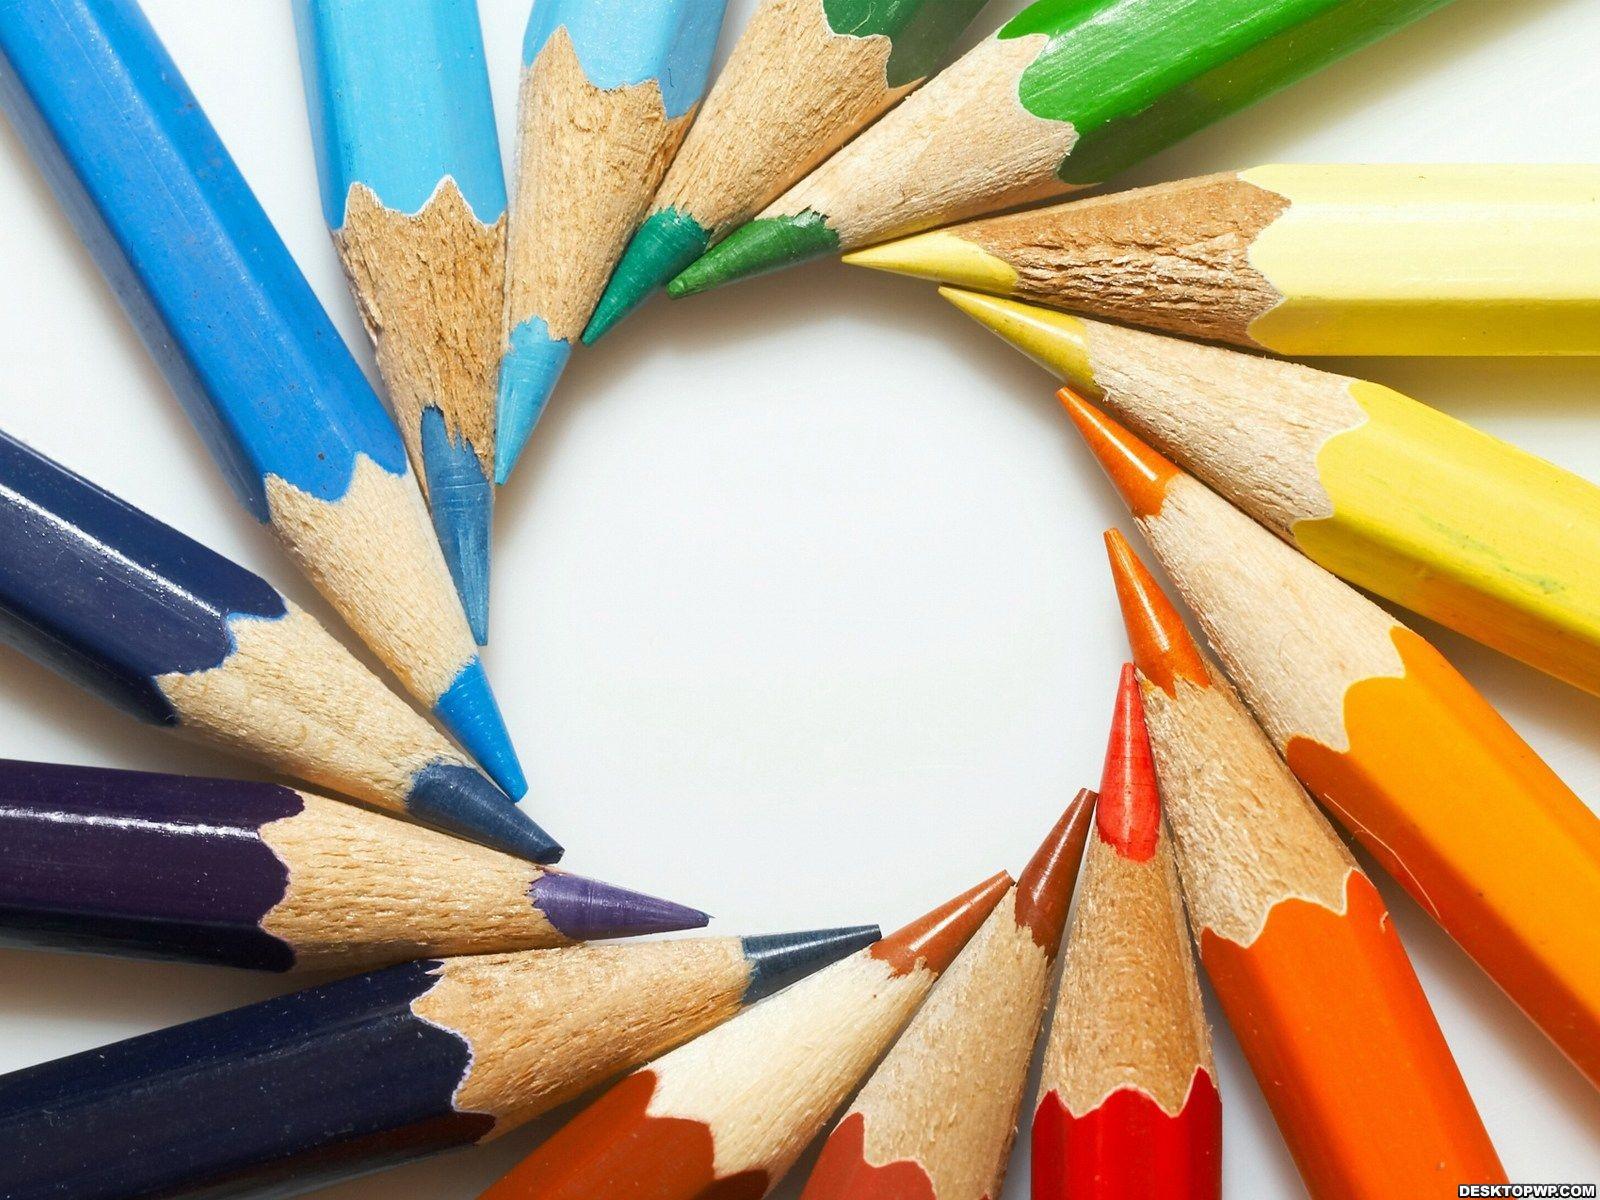 Saif Ali Khan Hd Wallpaper Colorful Pencils Wallpapers